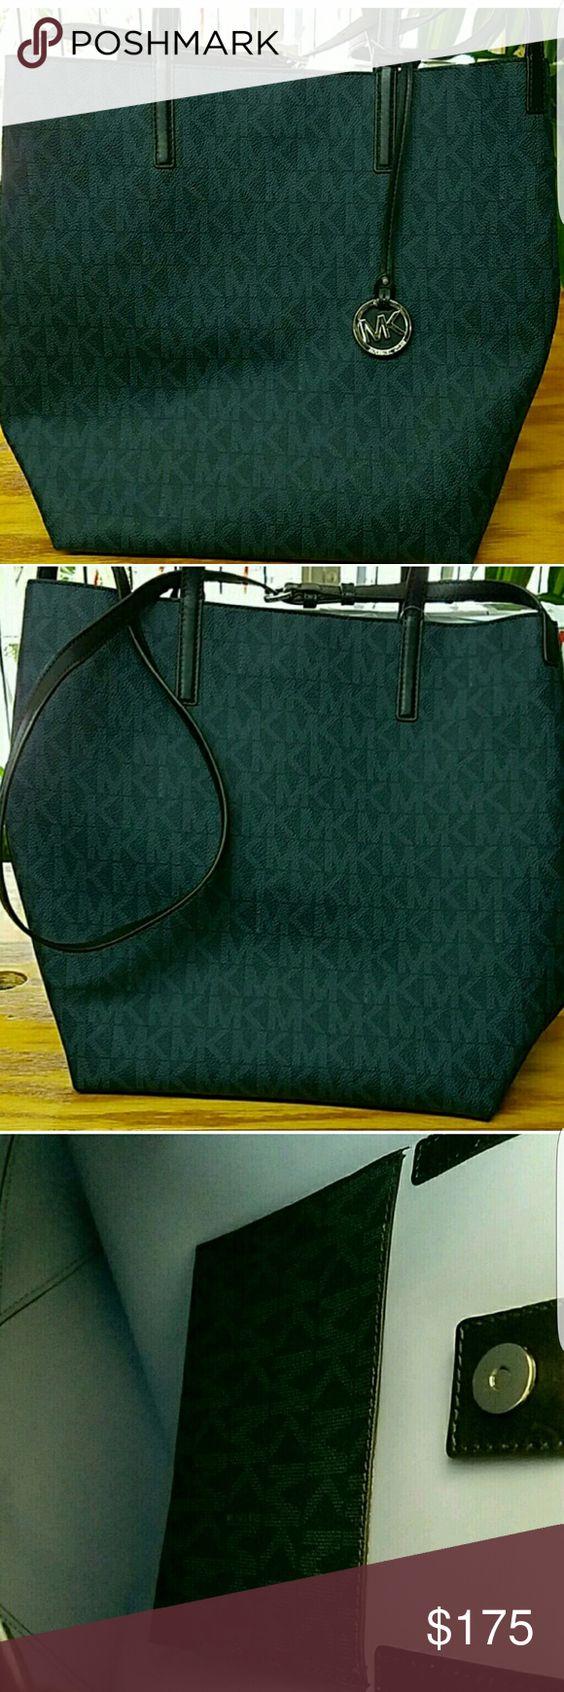 cheap michael kors handbags outlets michael kors blouse size large